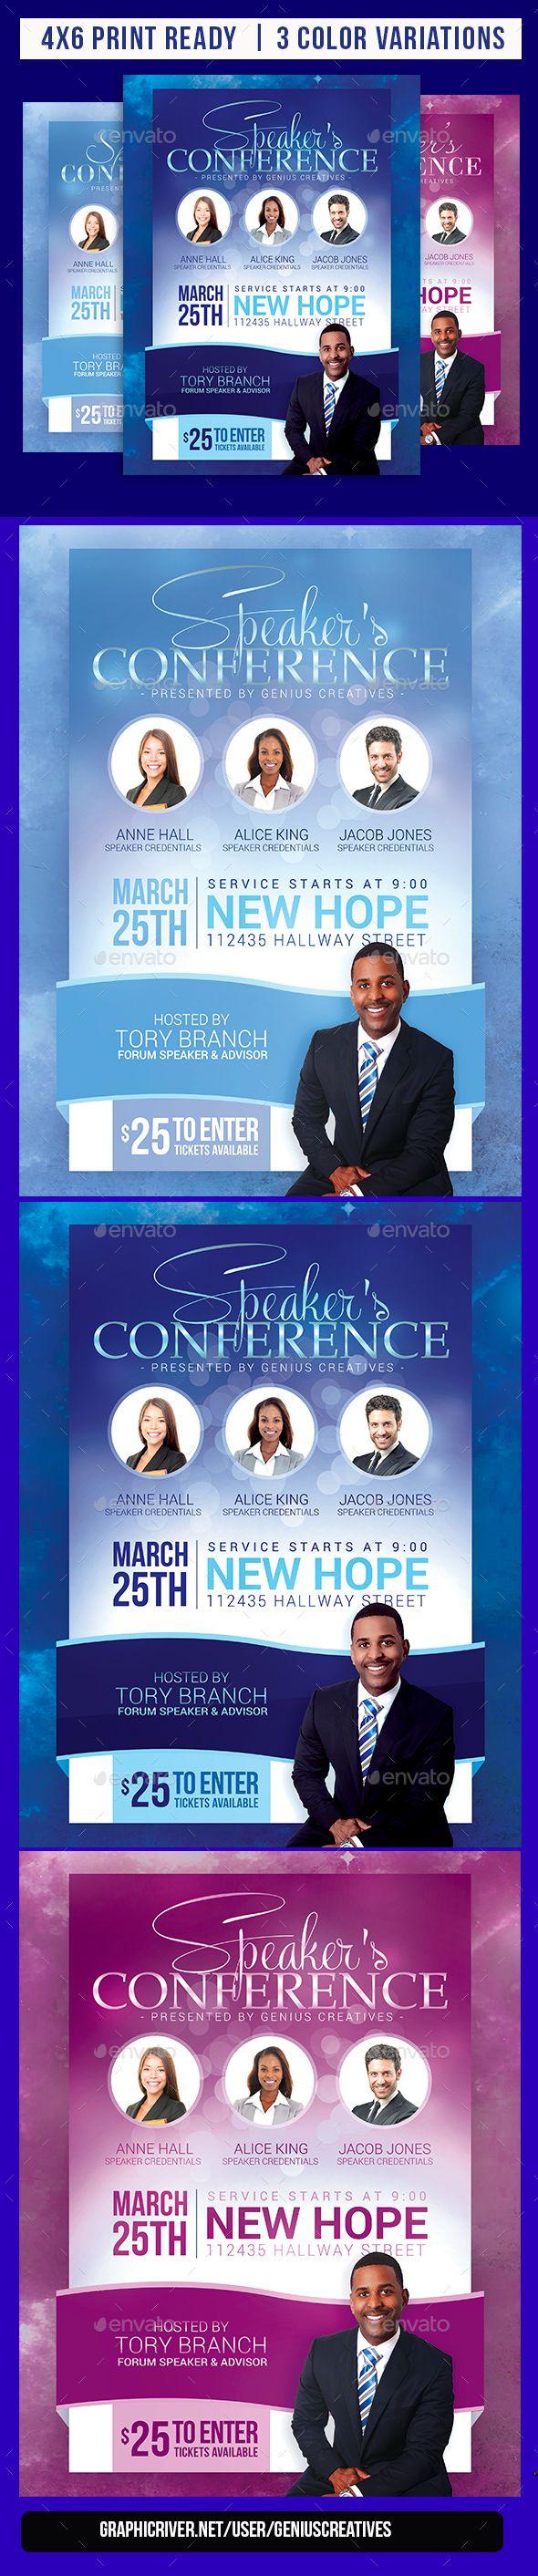 Church event or conference flyer flyer template churches and template church event or conference flyer saigontimesfo